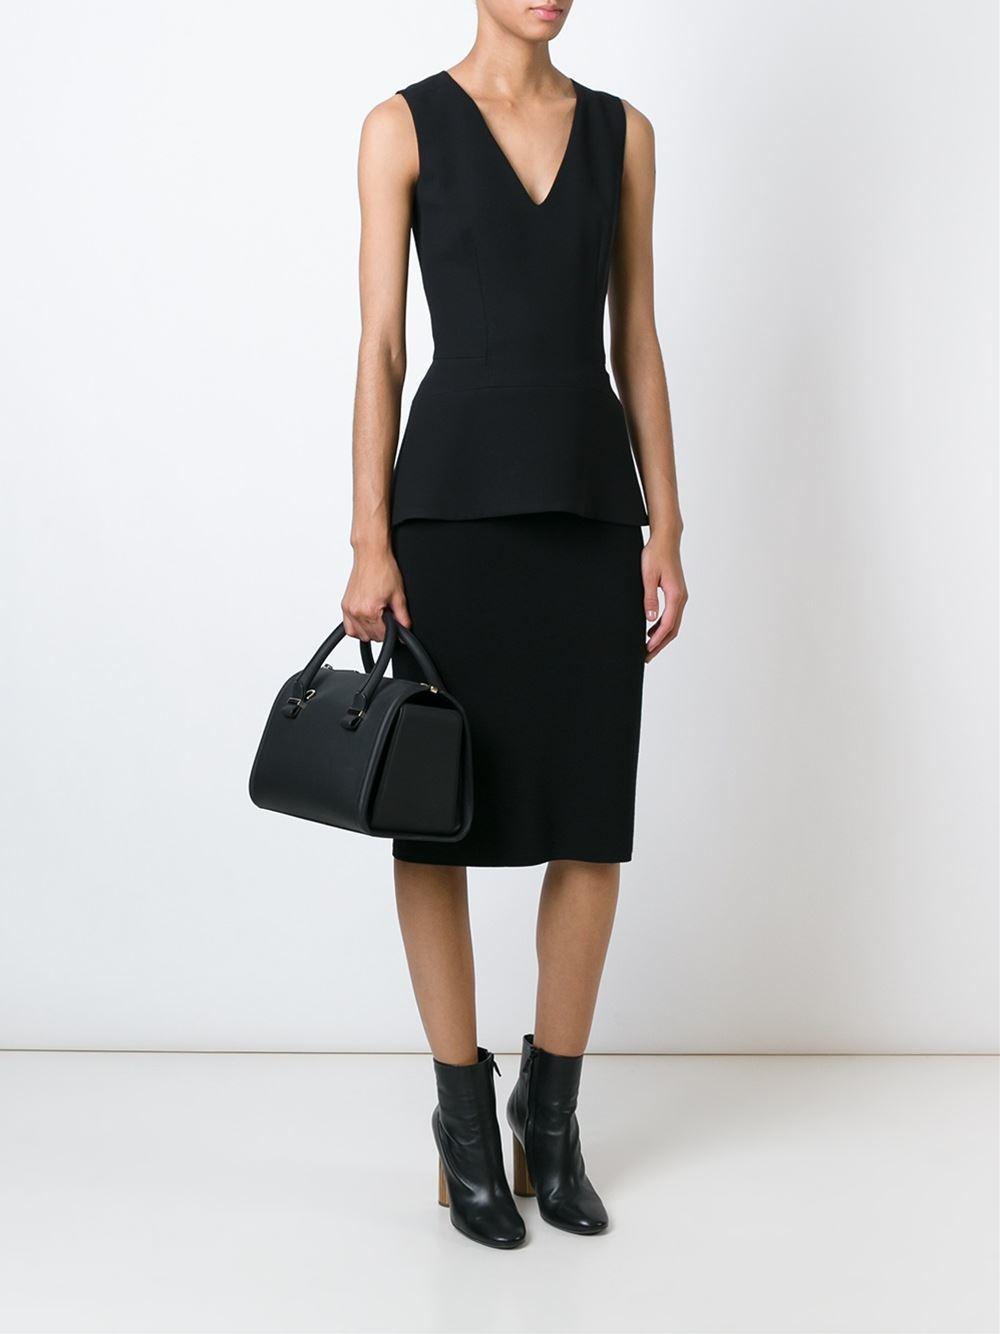 Victoria Beckham 'seven' Tote in Black